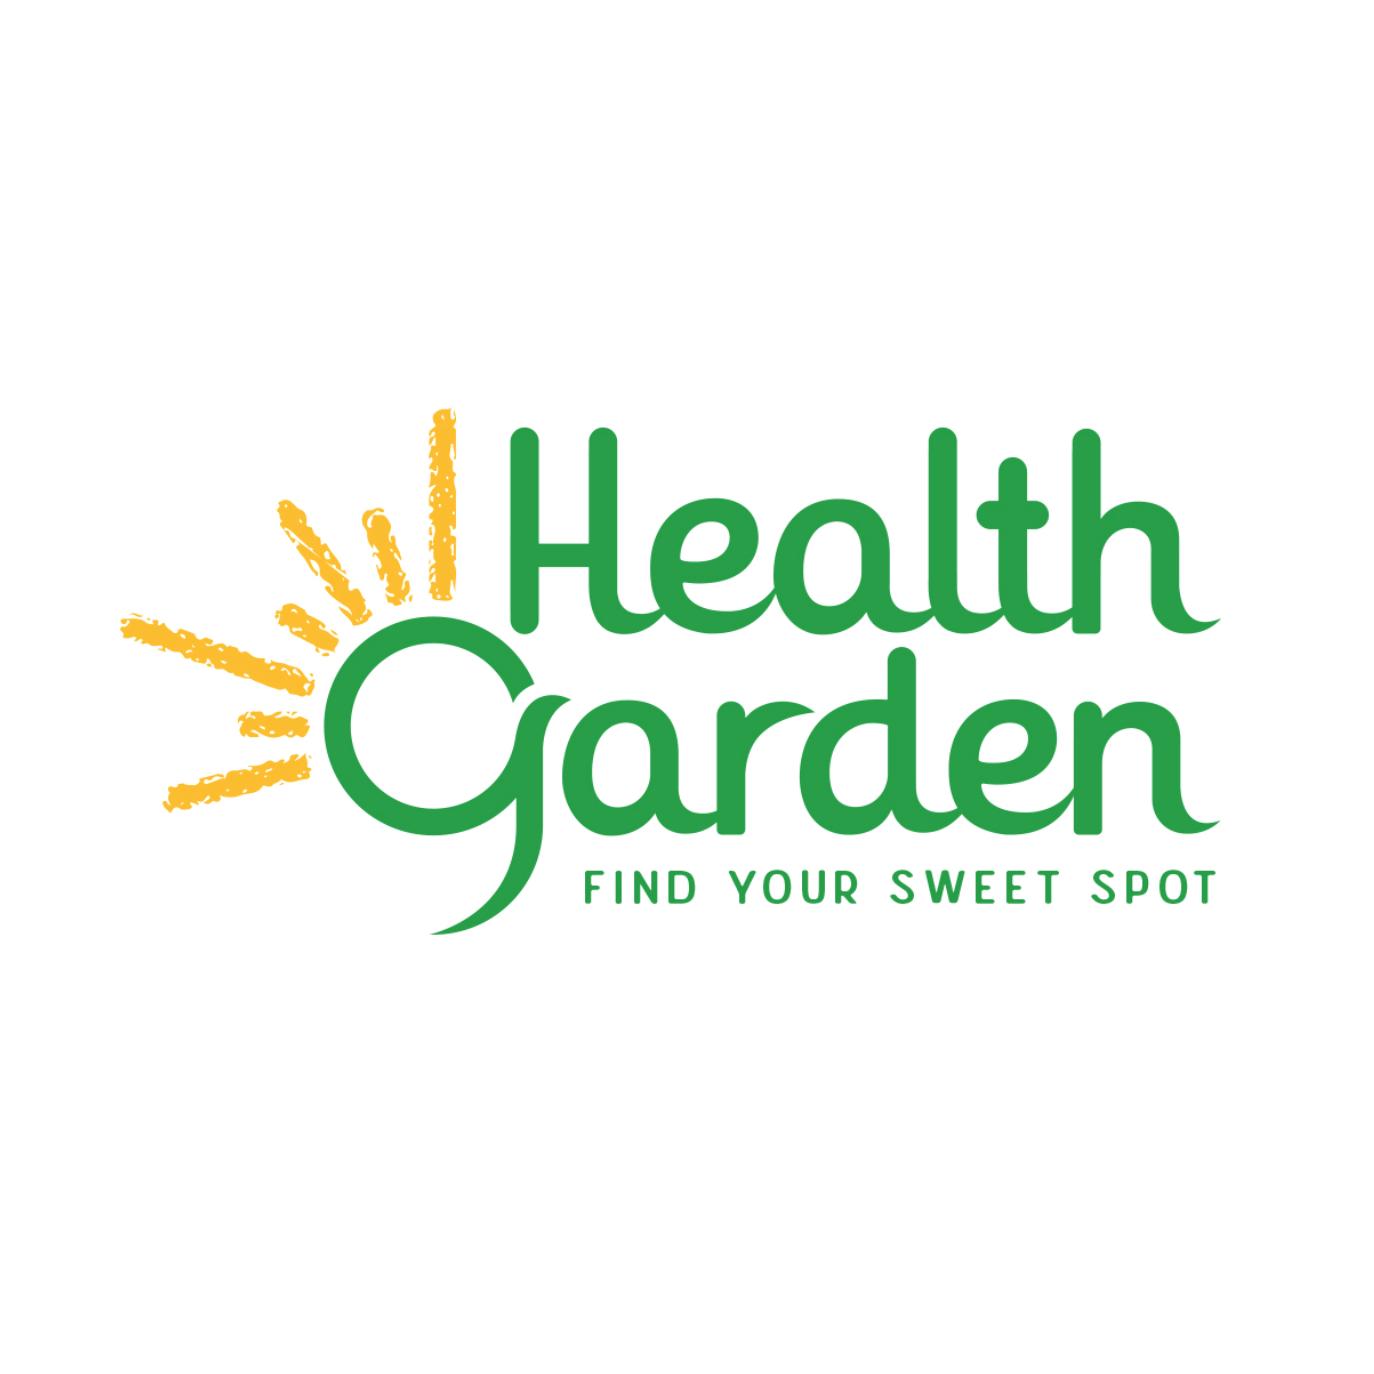 Health Garden of NY logo v2 - Certified Paleo, Grain Free Gluten Free, Keto Certified, Paleo Vegan by the Paleo Foundation